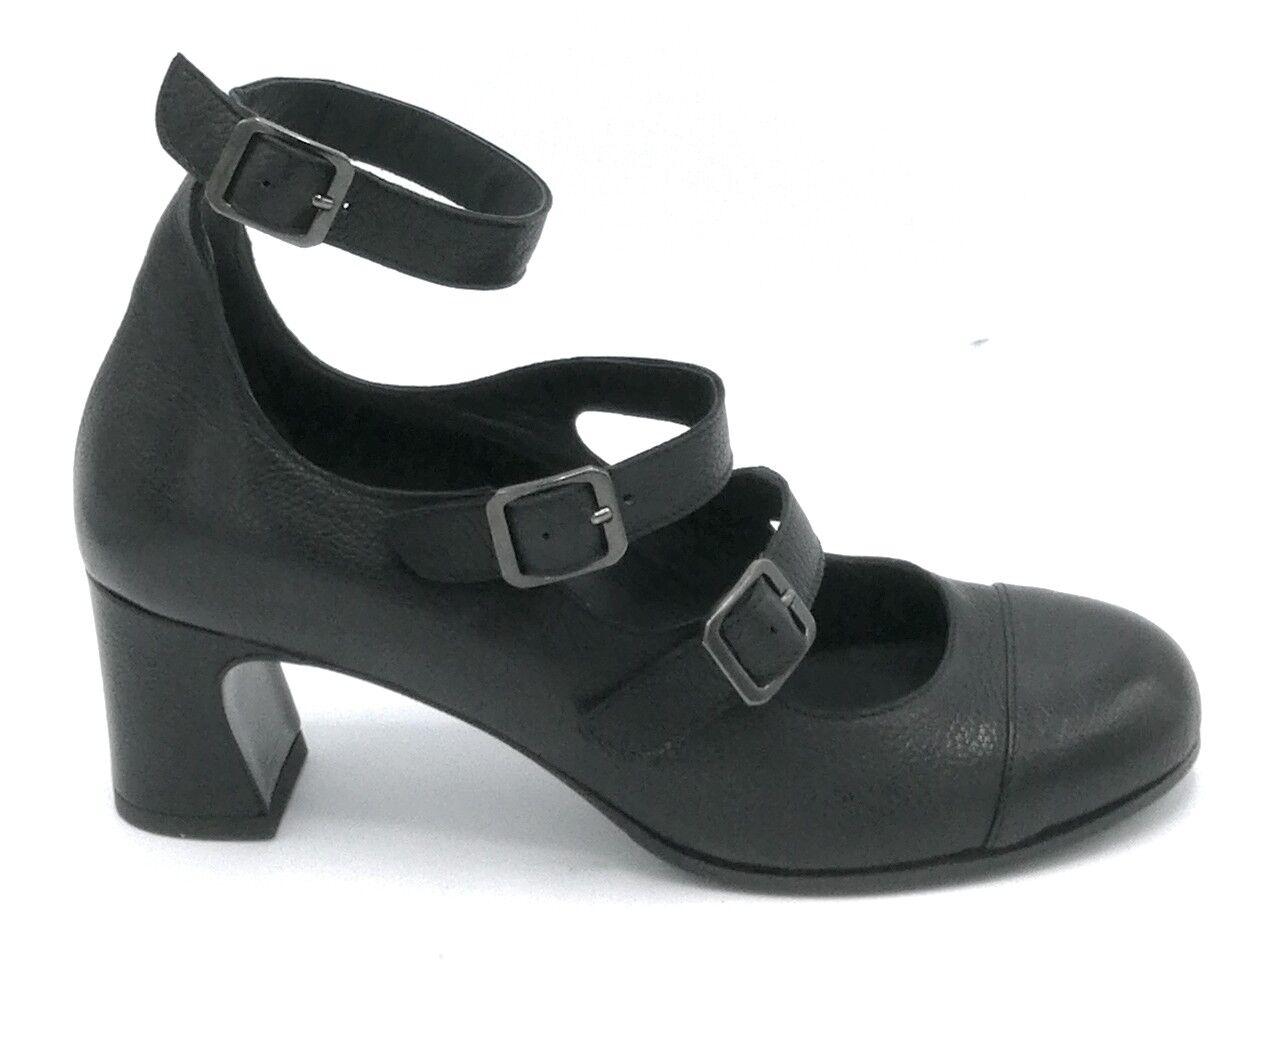 Le Trallerine 305 sandale cuir buffle noir courroies talon 7 cm